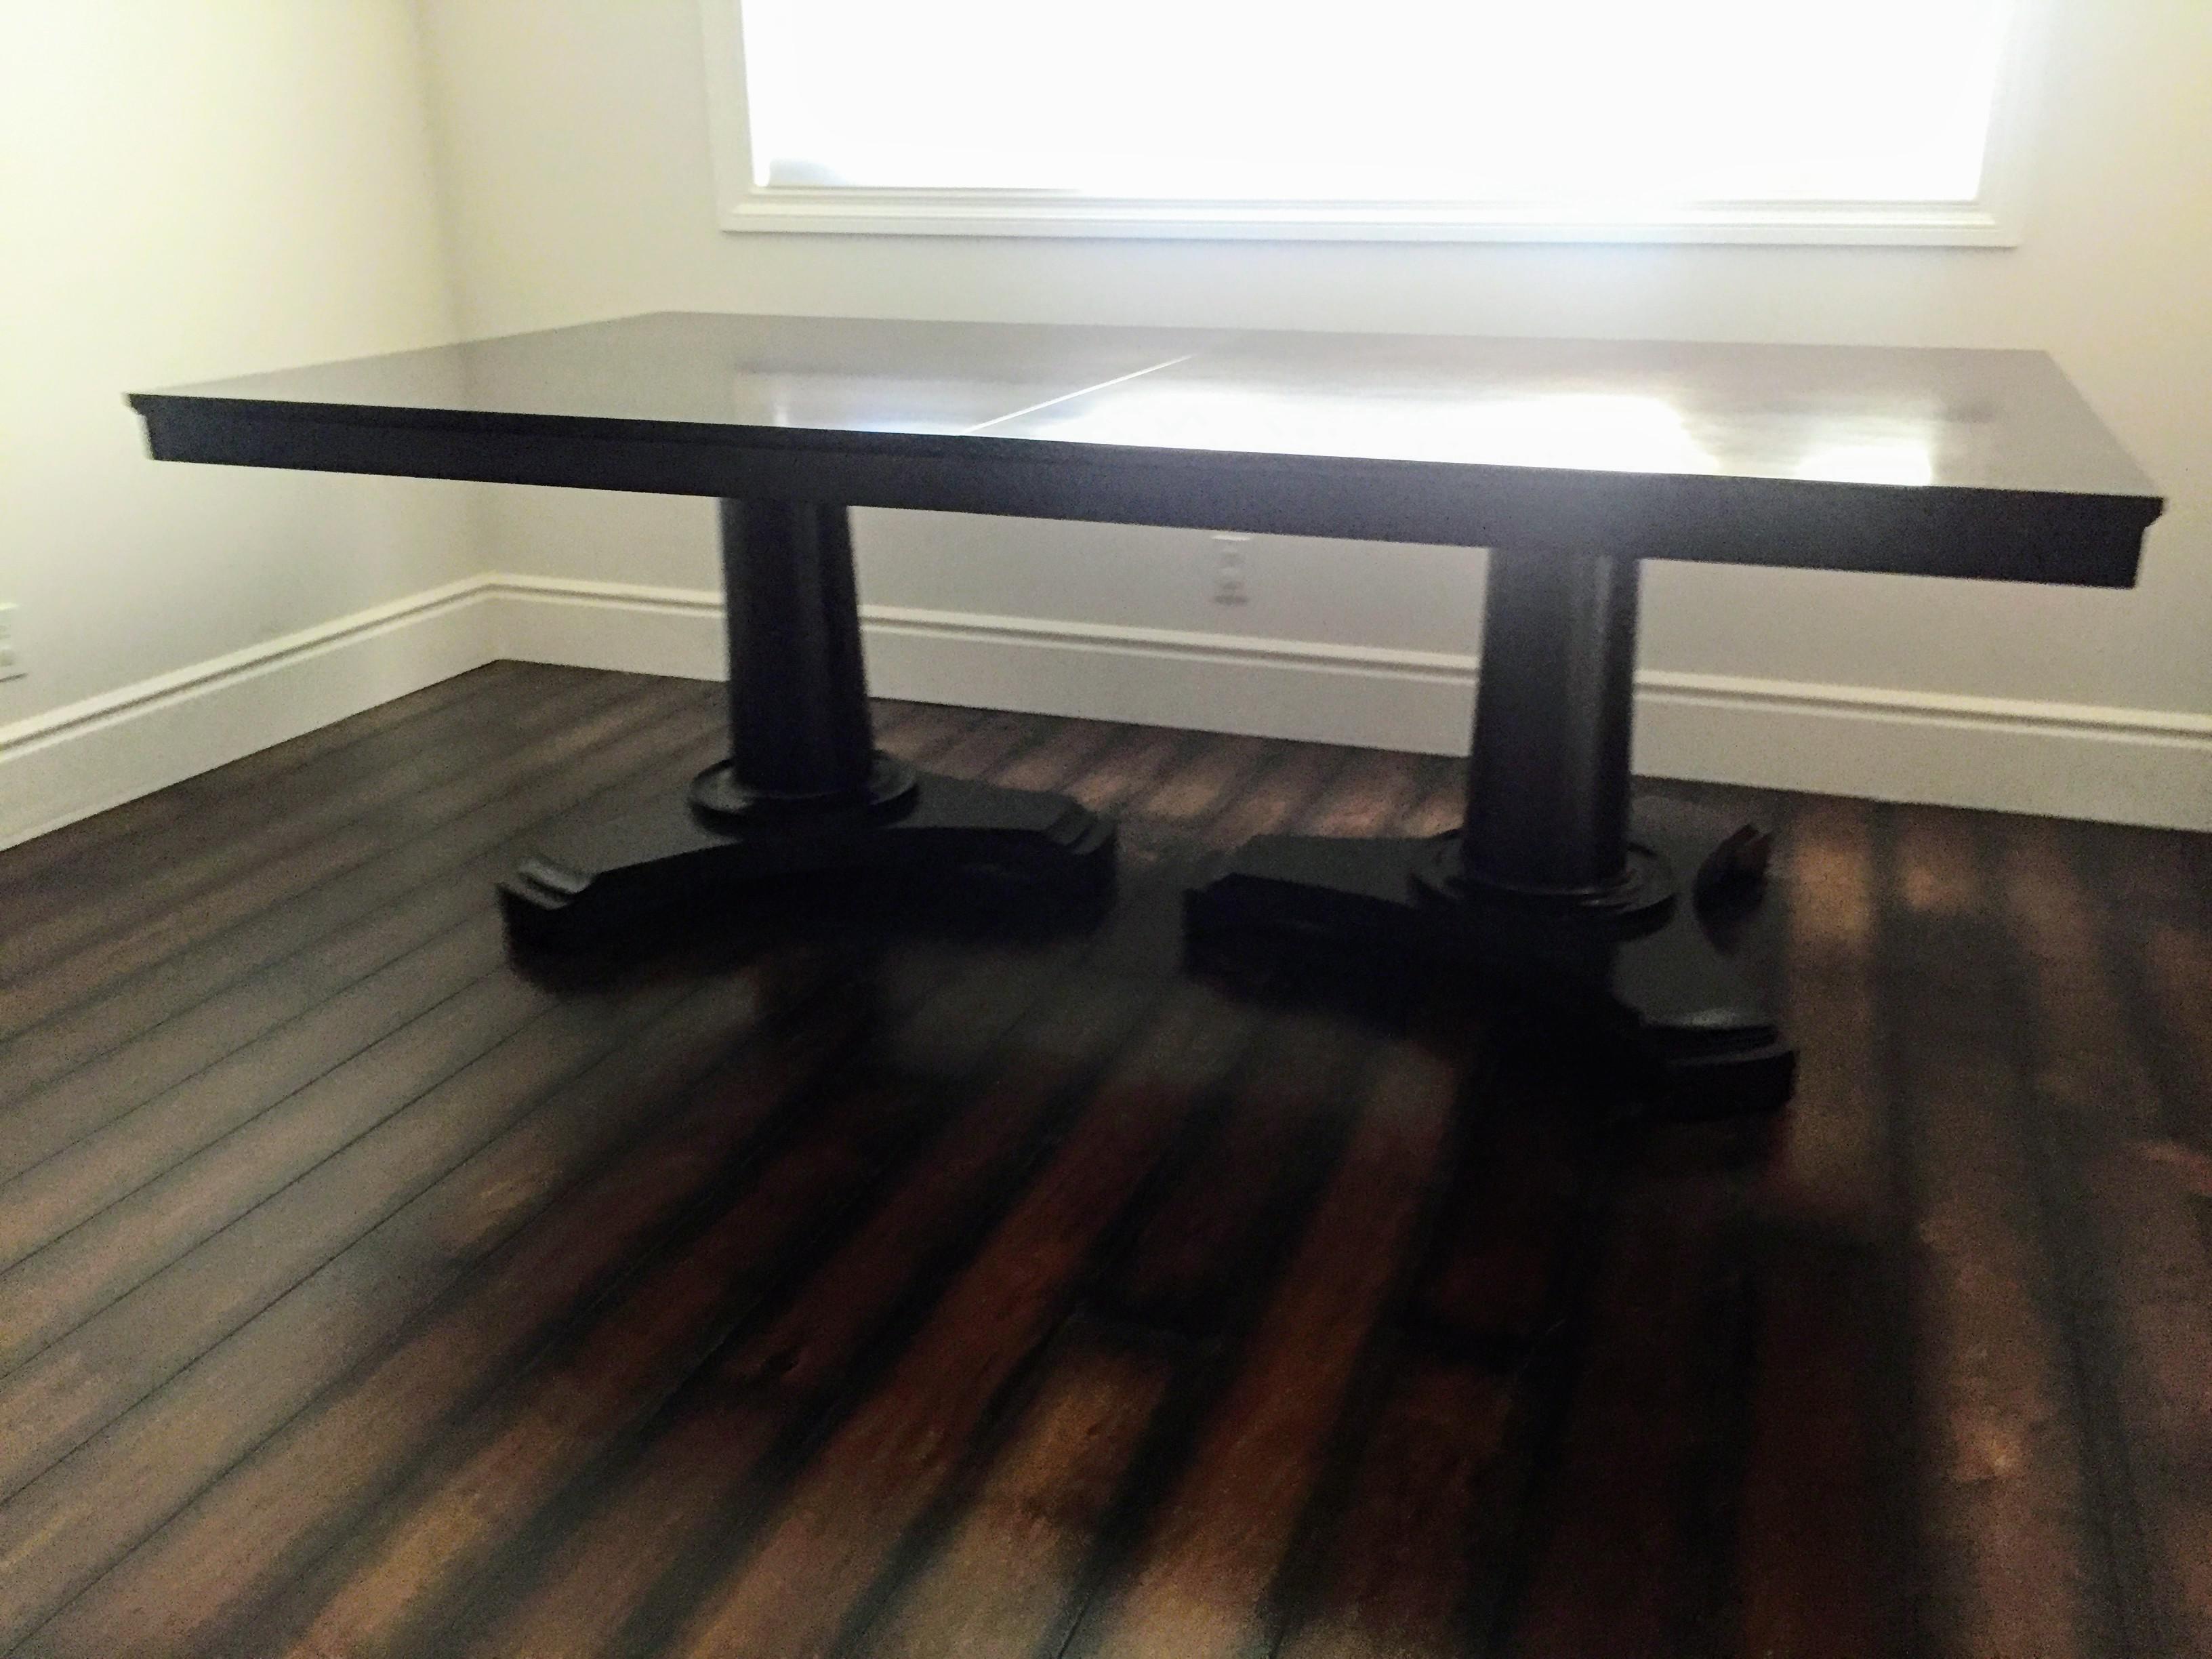 Restoration Hardware Portman Espresso Dining Table Chairish : 1ca61610 62f3 4949 ac40 5eaf30bd0103aspectfitampwidth640ampheight640 from www.chairish.com size 640 x 640 jpeg 30kB